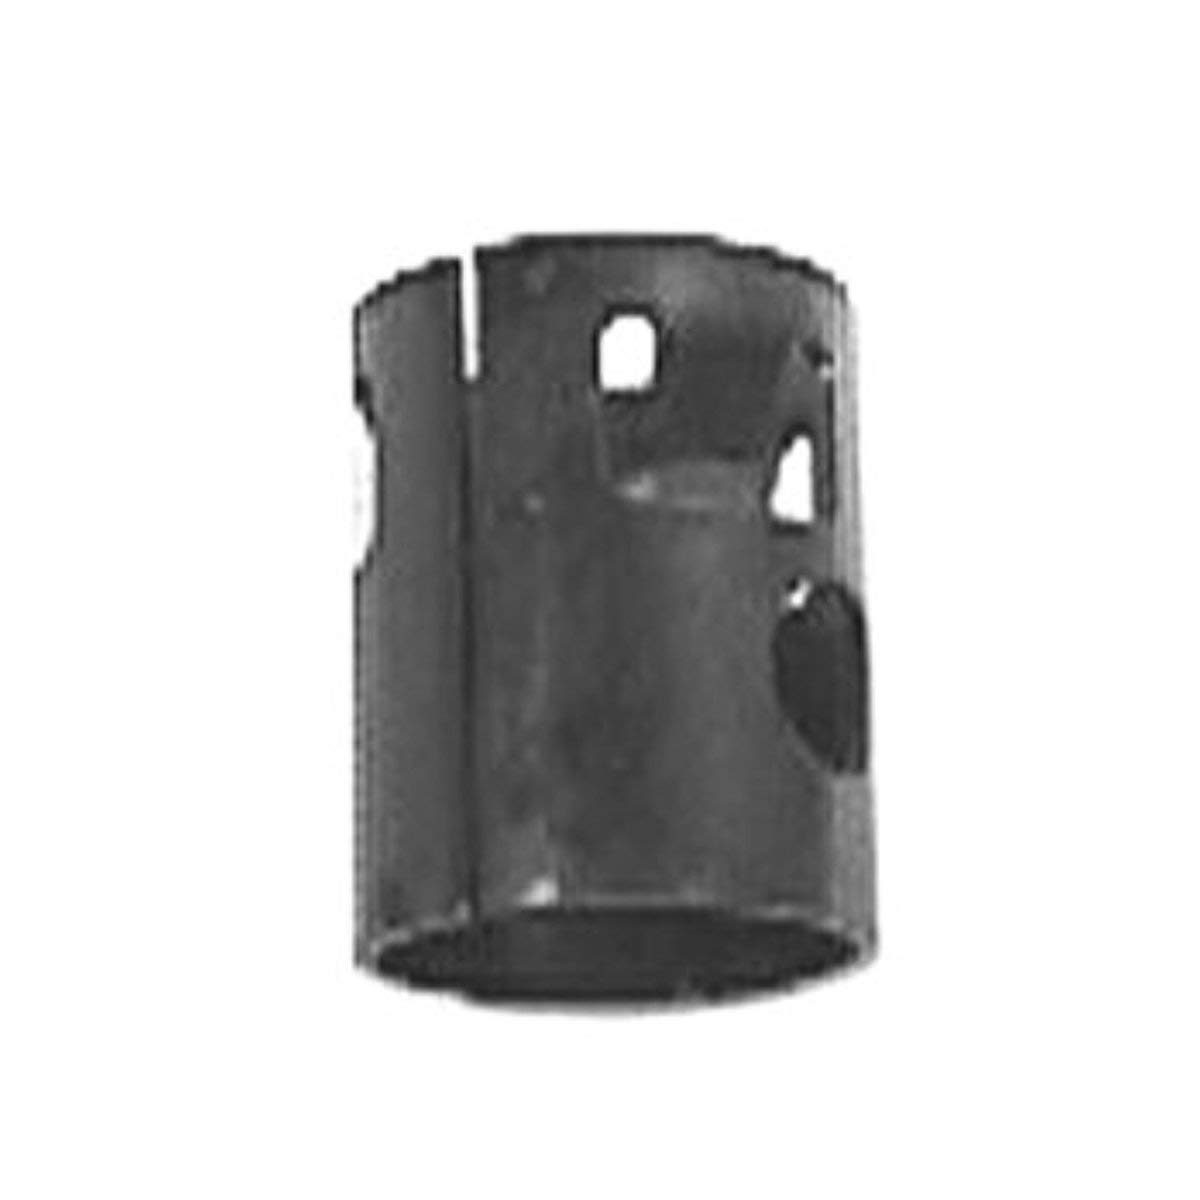 Driveshaft  Johnson//Evinrude 20-30hp  338504 Retainer